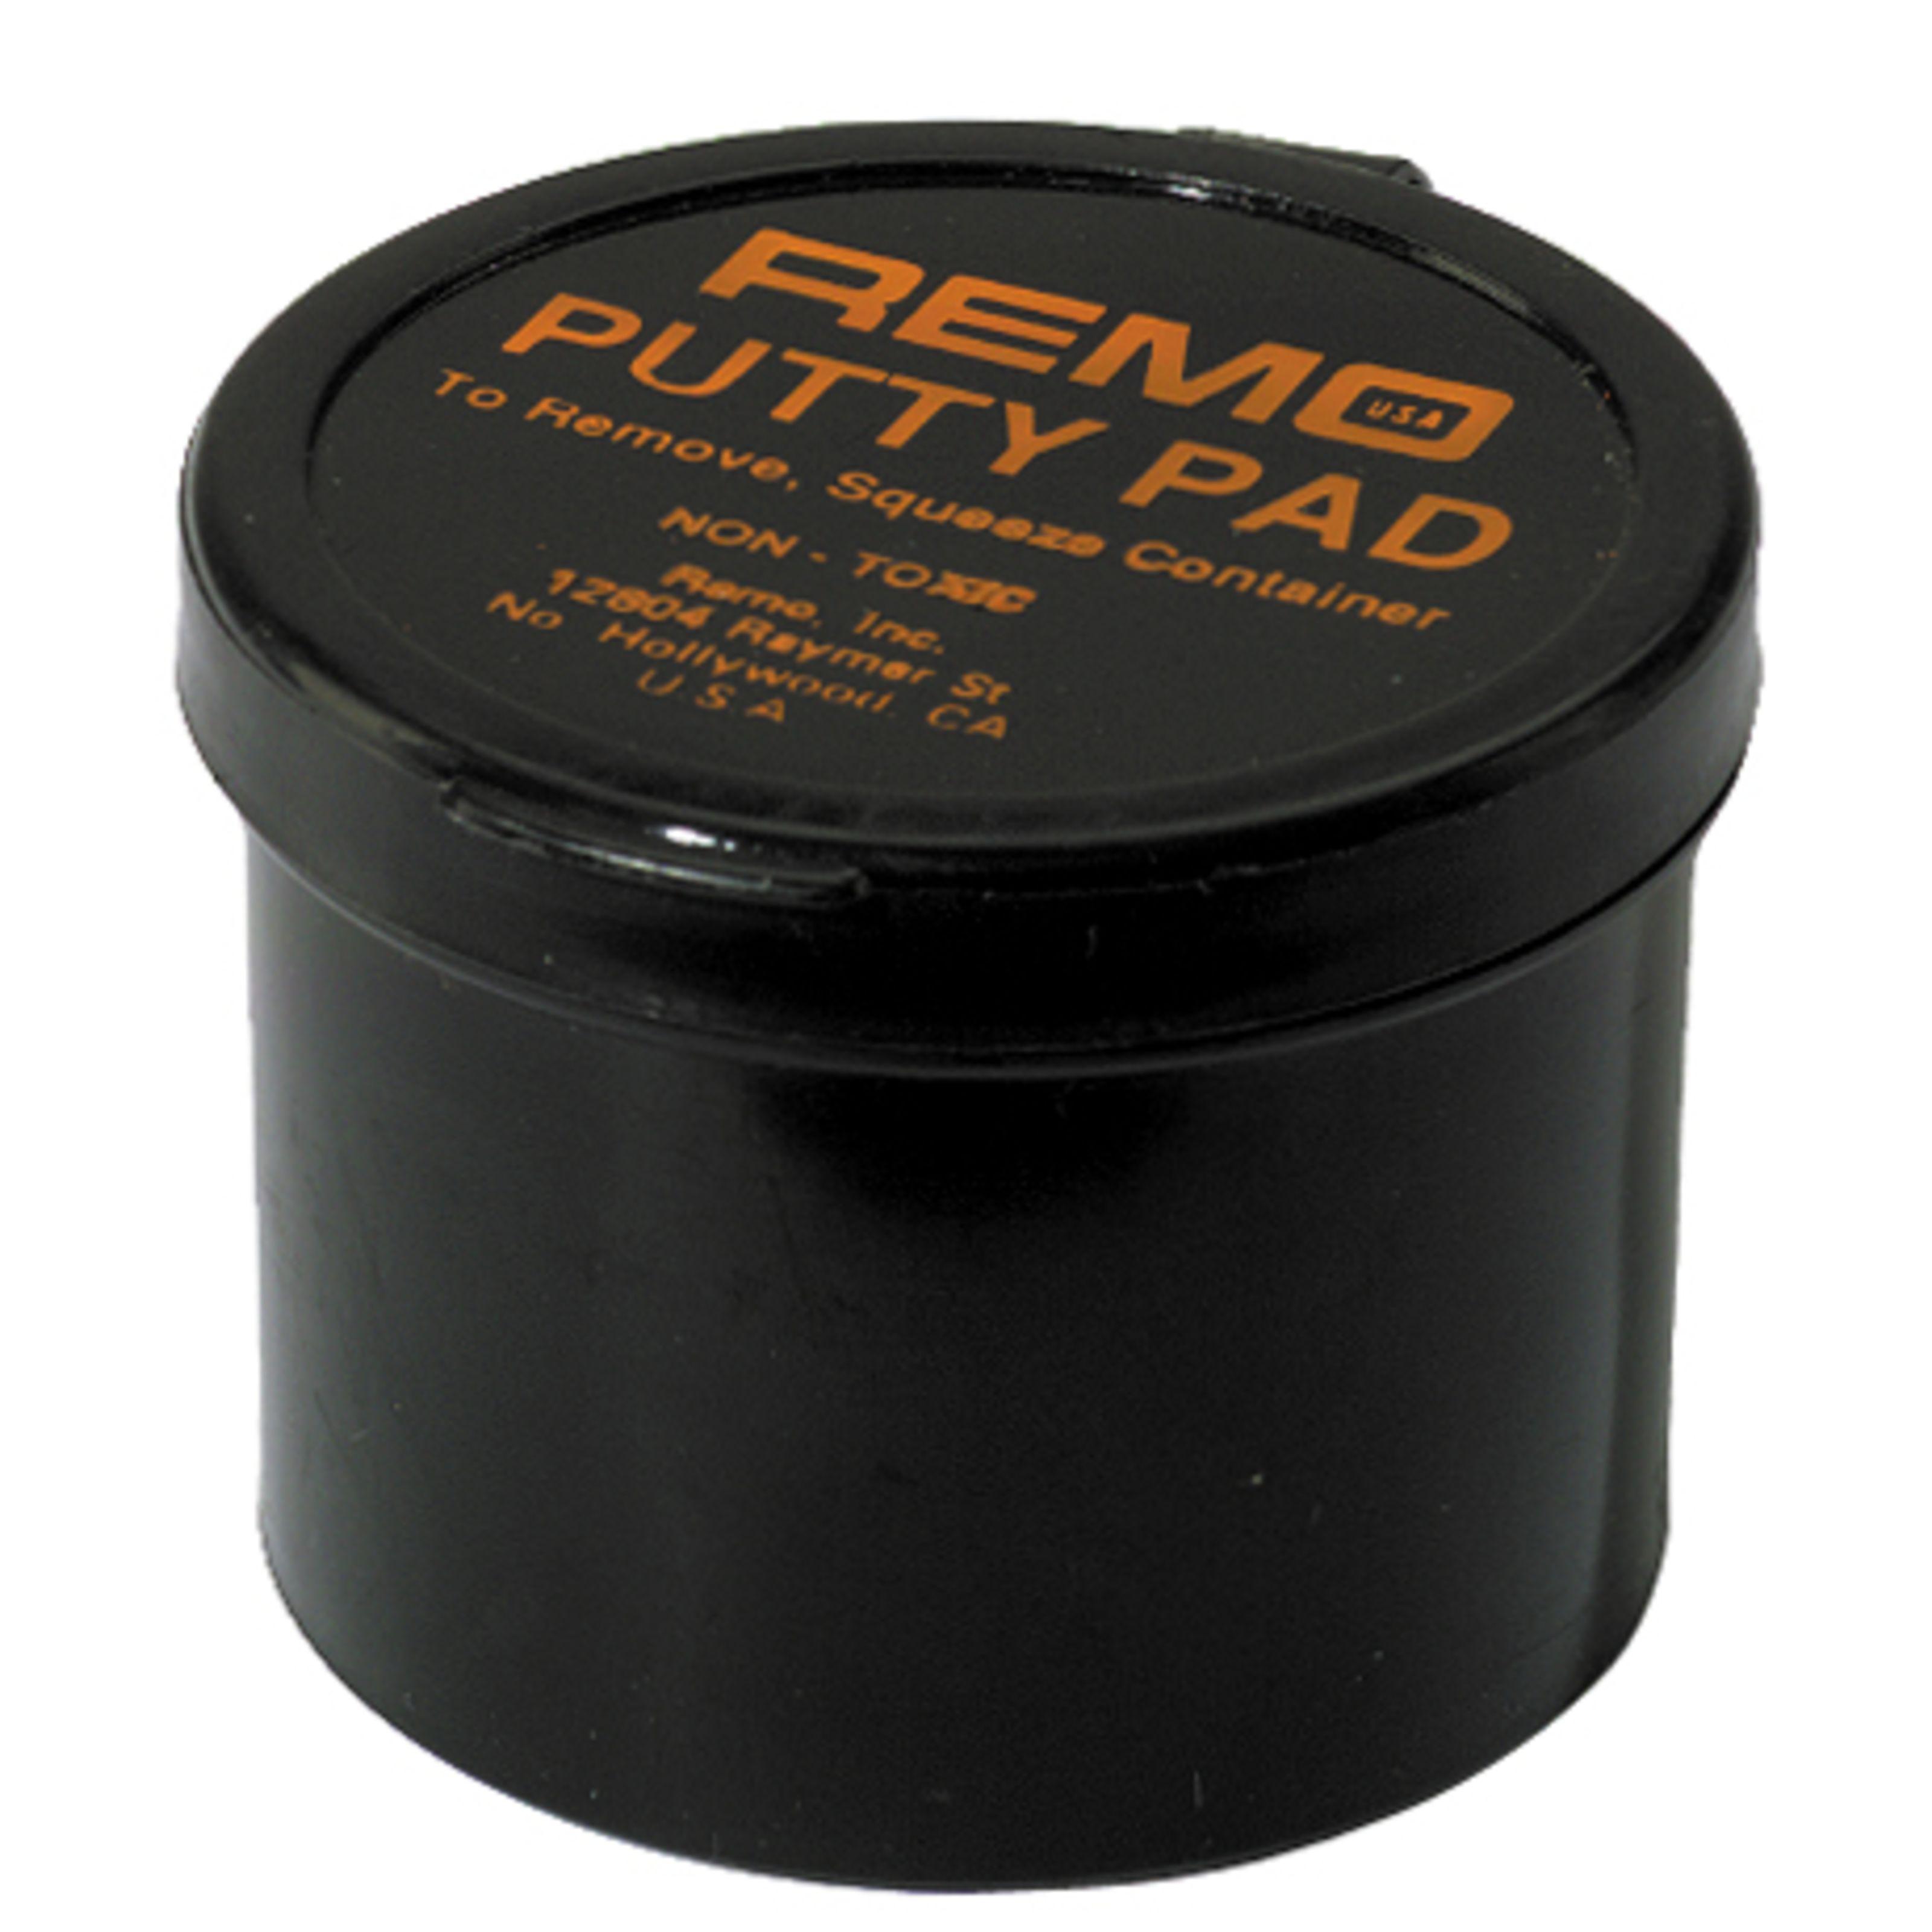 Remo - Putty Pad Übungspad, ausrollbare Knetmasse 814.560